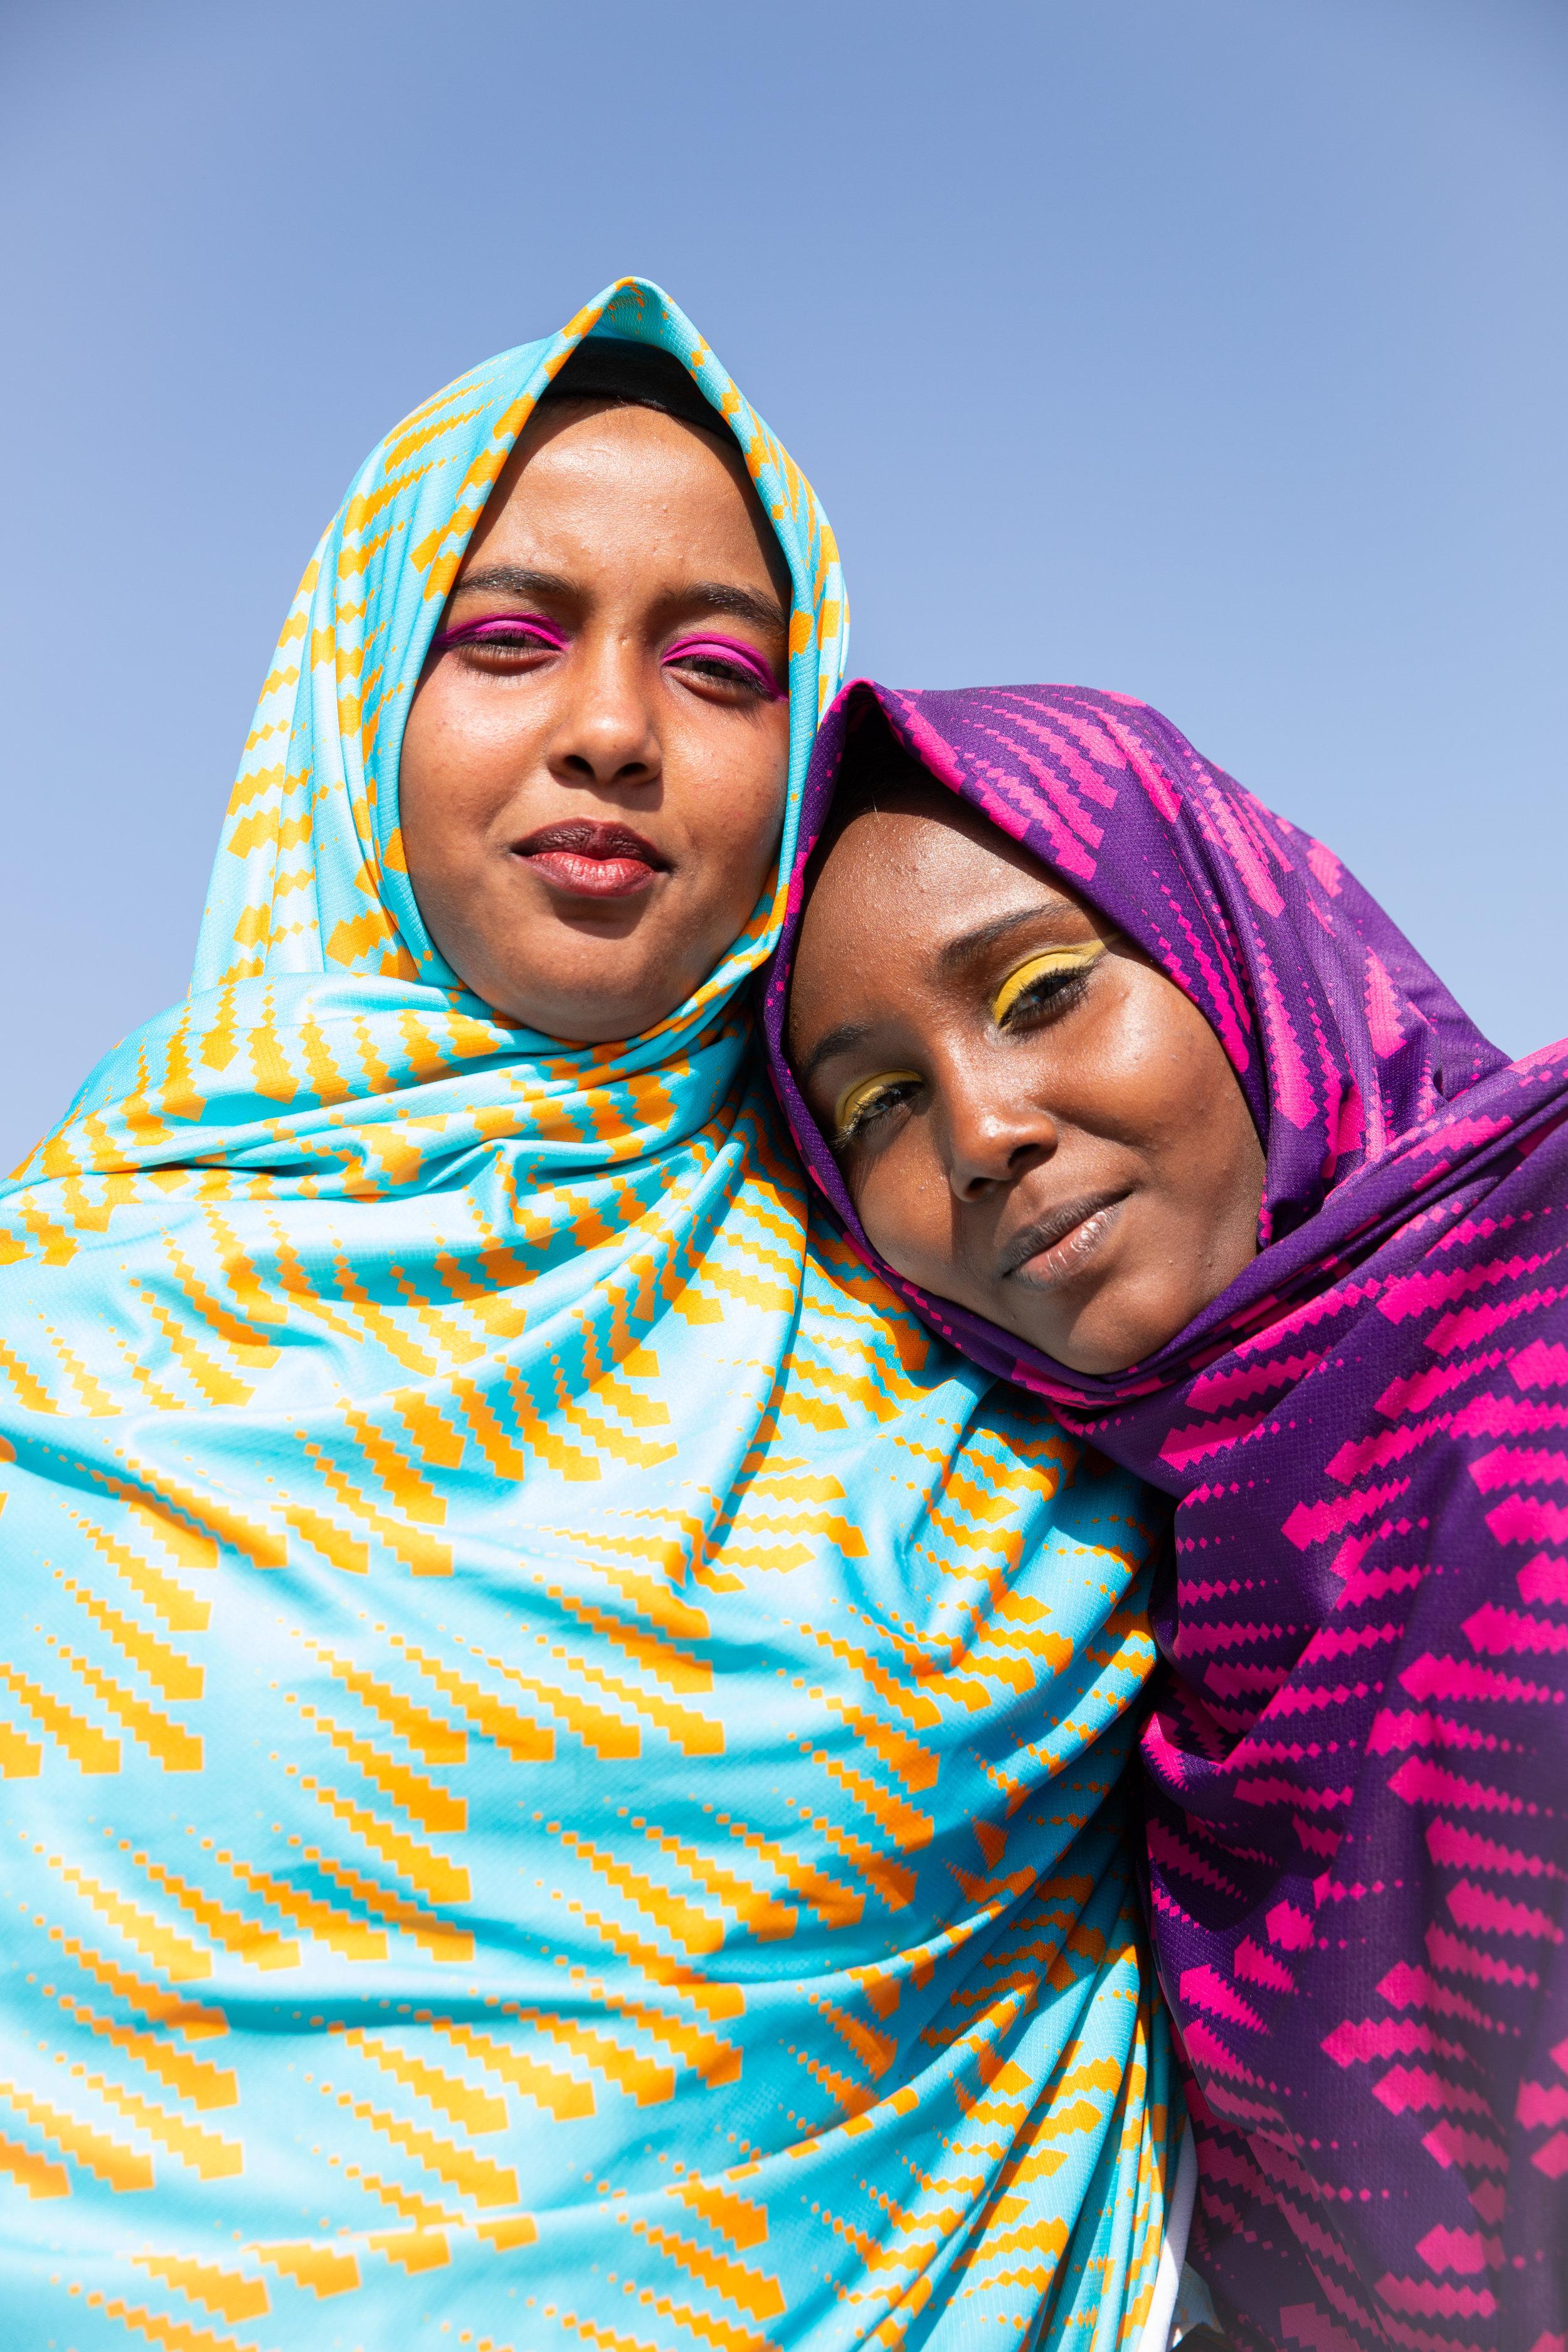 06_KLABU Campaign image _ by Coco Olakunle.jpg